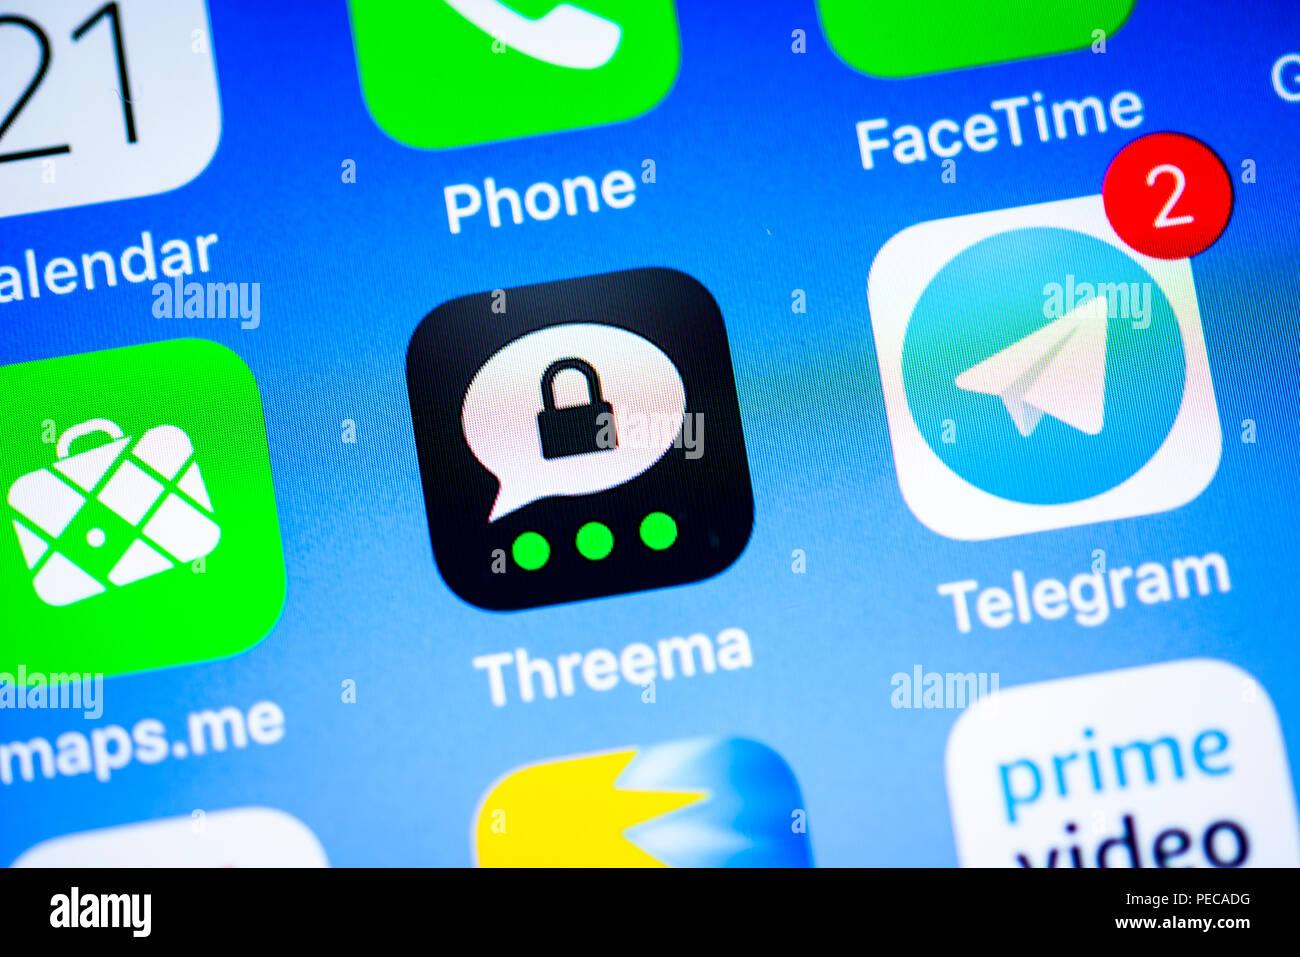 Threema, secure Instant Messenger App, icona app, display iPhone, iOS, smartphone, display close-up, dettaglio, Germania Immagini Stock